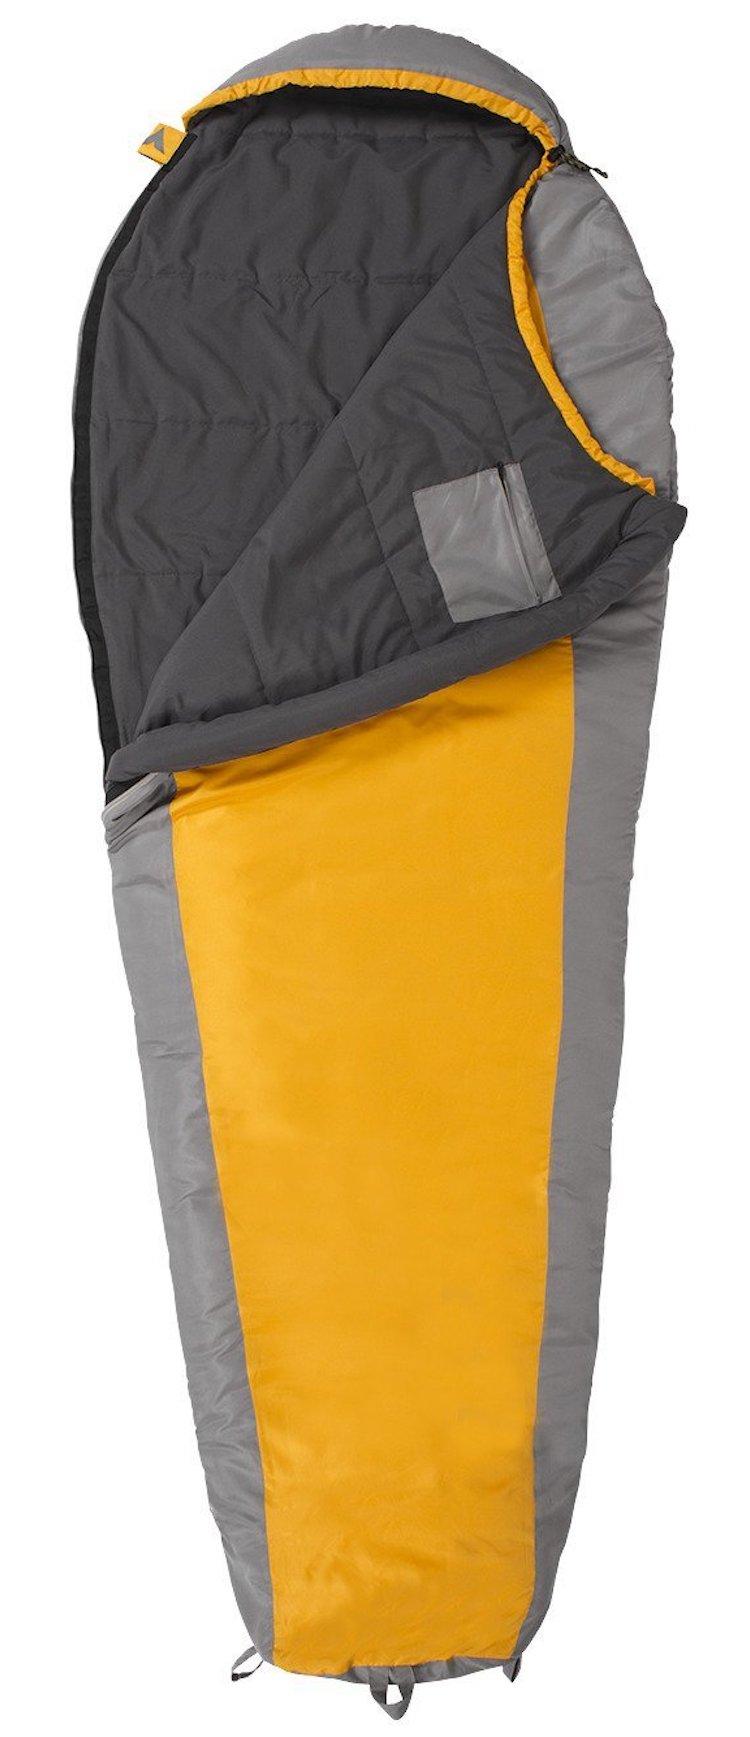 Teton Sports TrailHead Ultralight Sleeping Bag